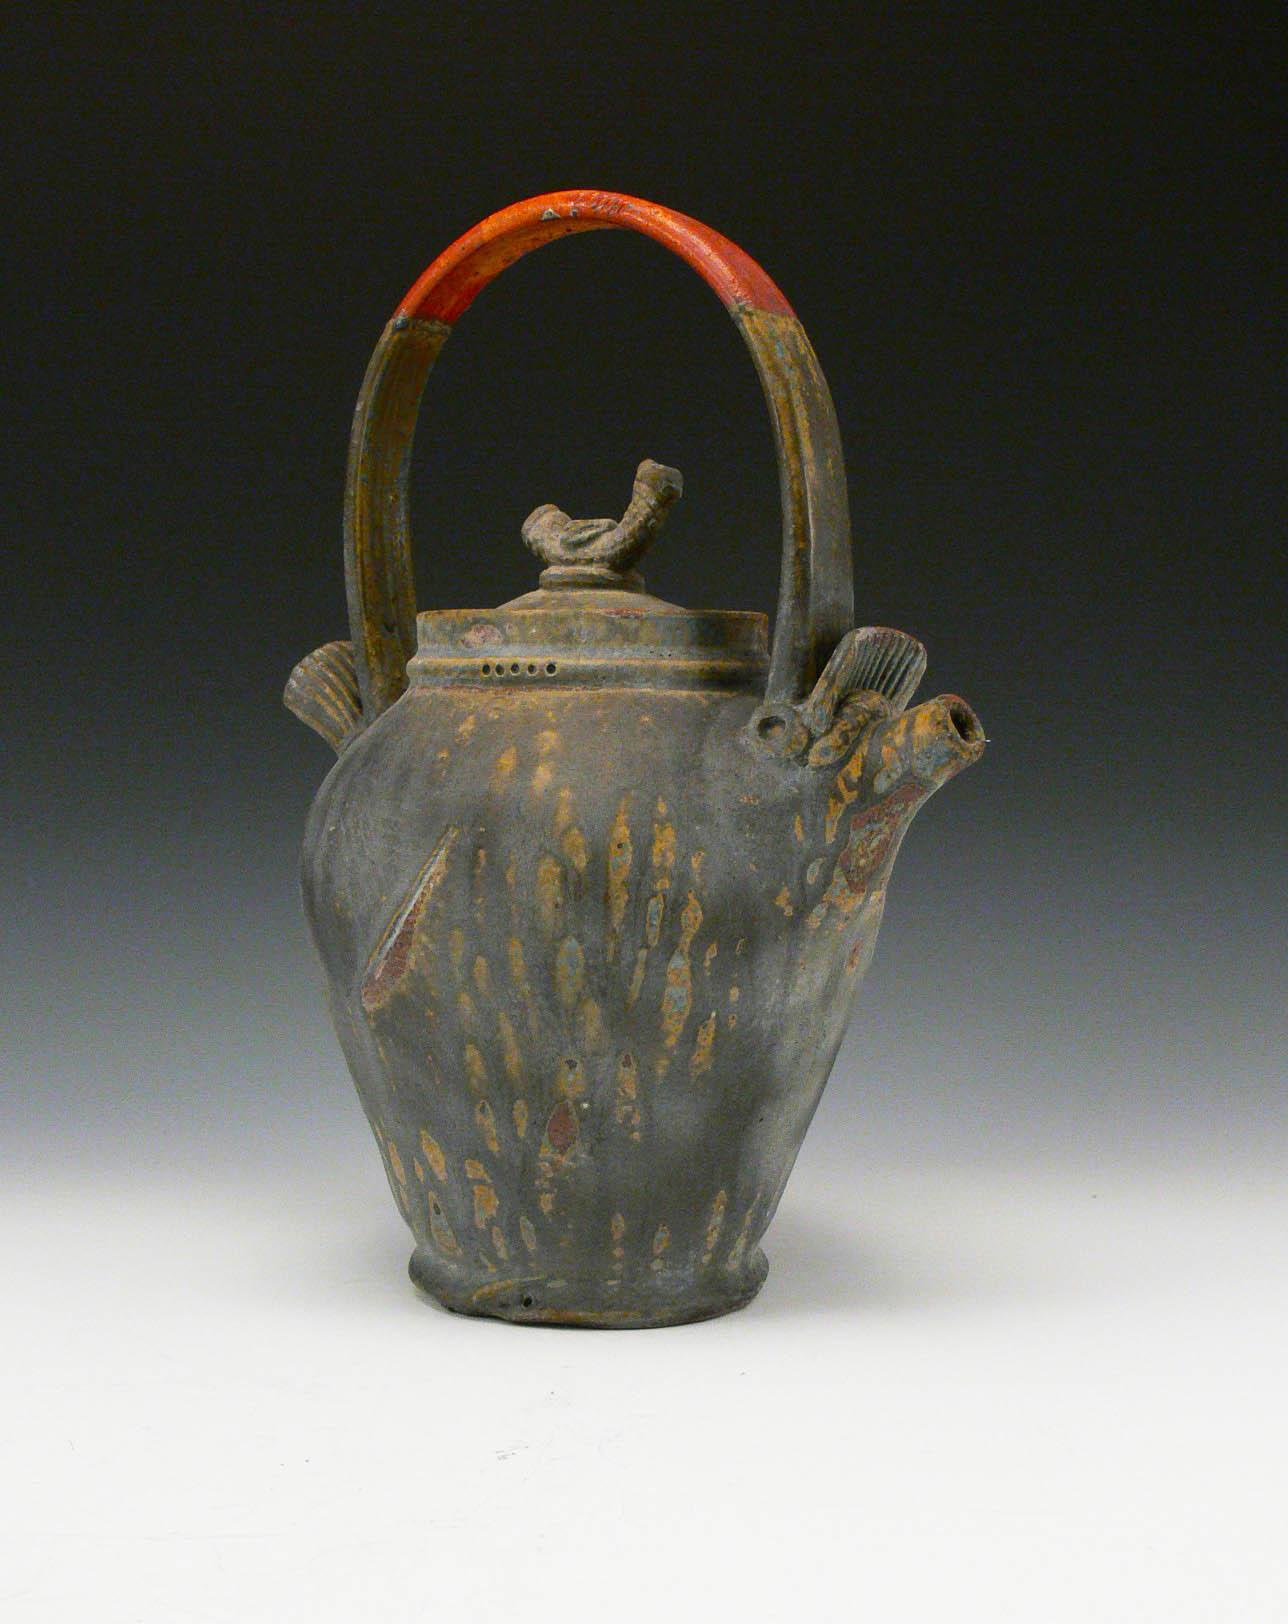 Blasted Teapot